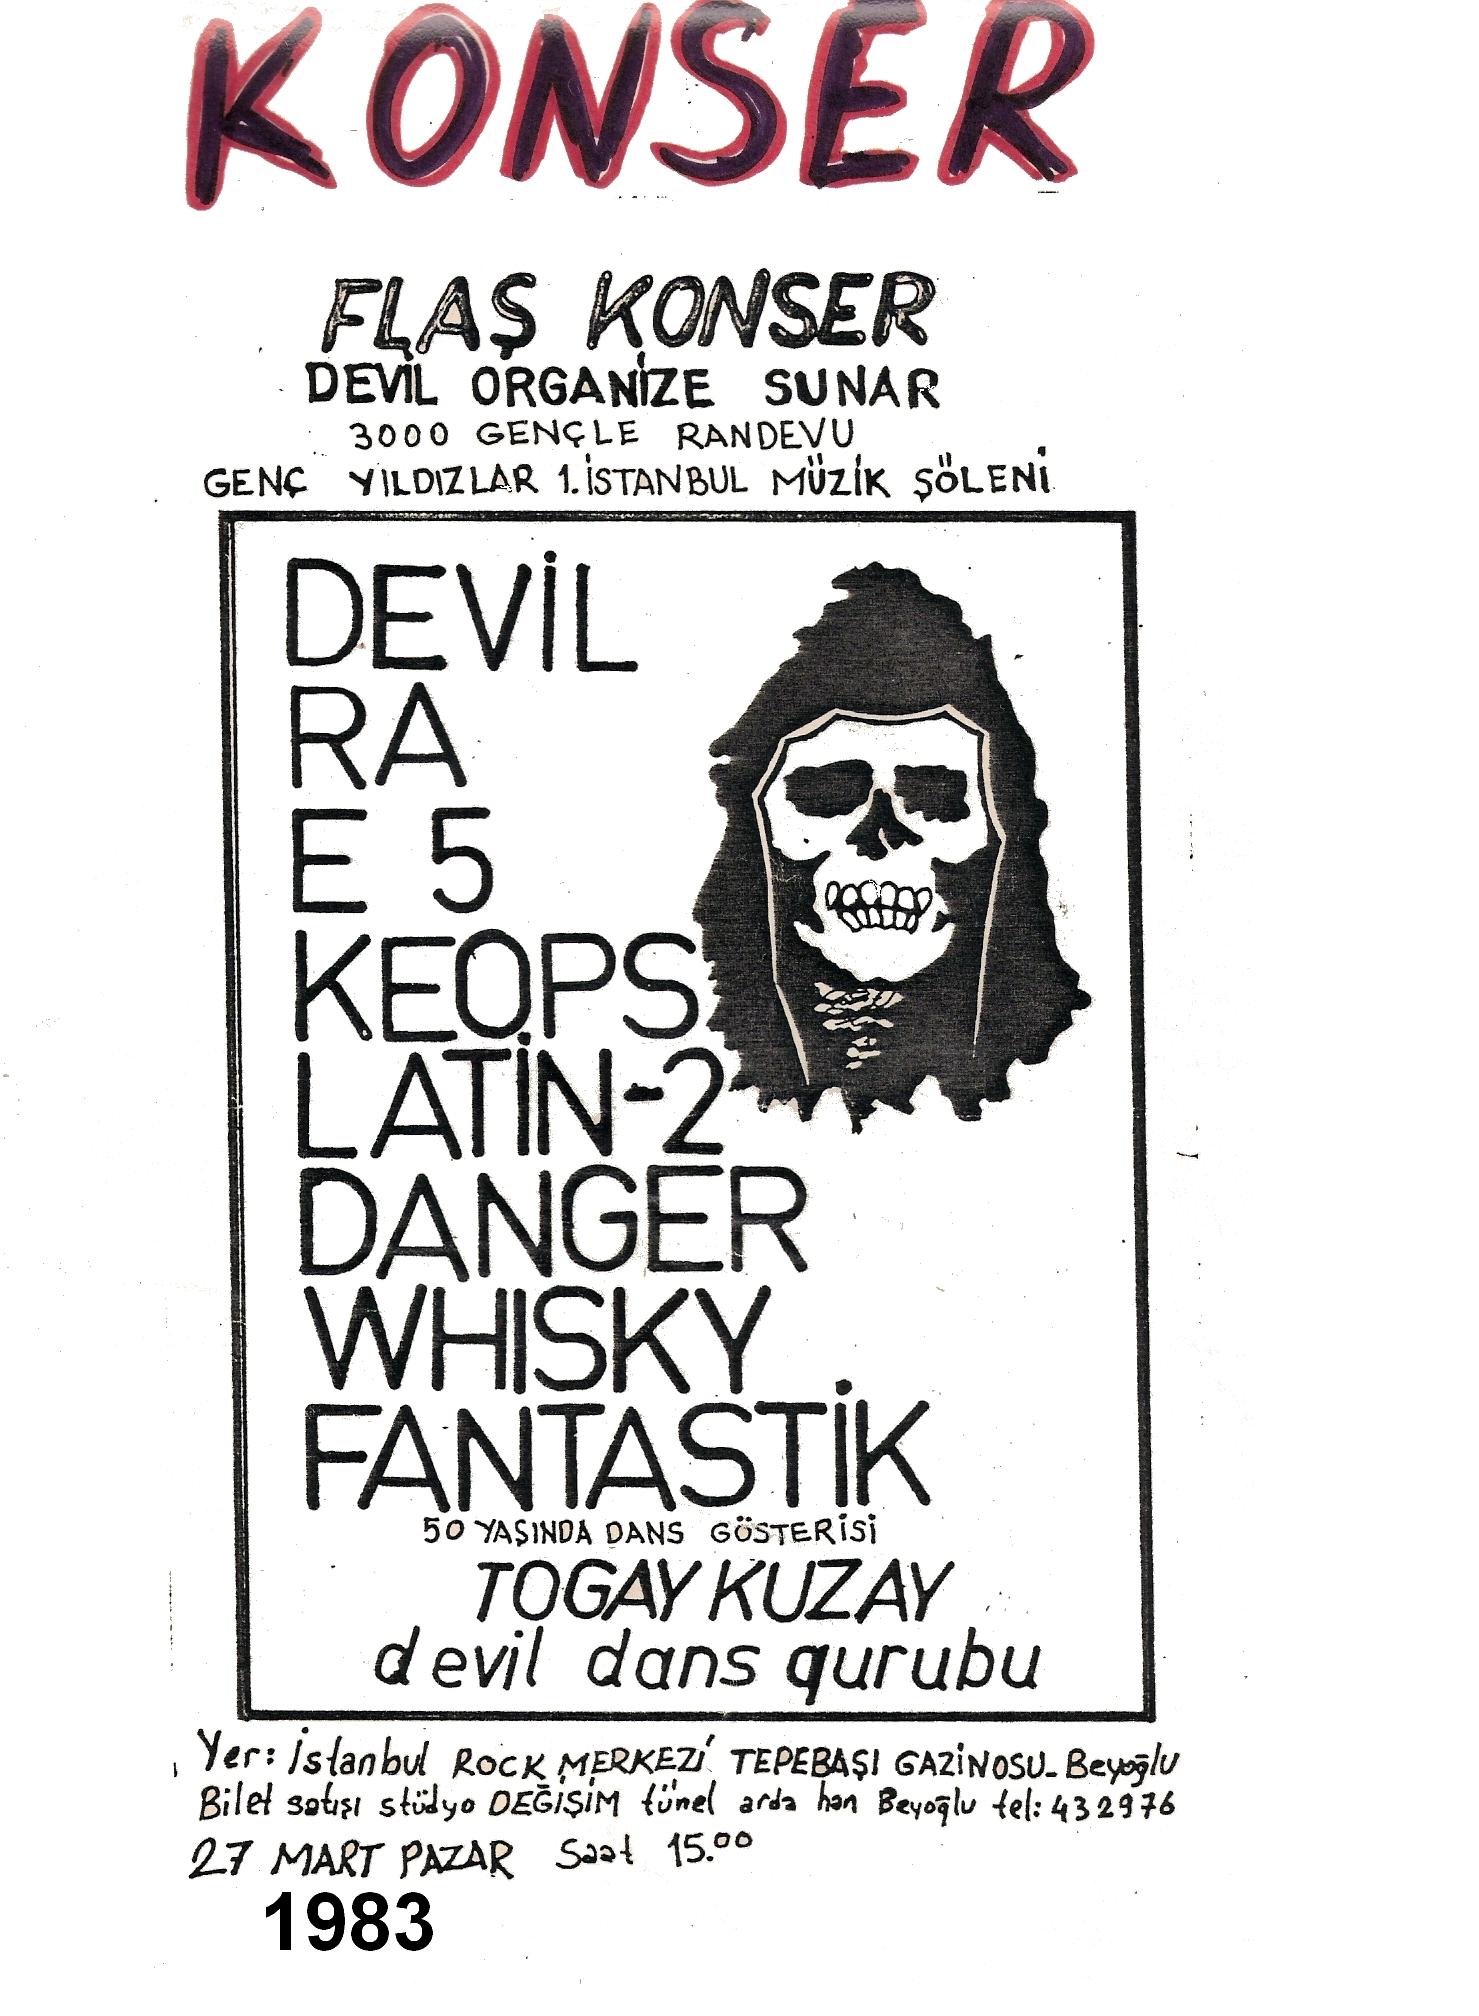 1983-03-27 Devil, Ra, E-5, Keops, Latin-2, Danger, Whisky, Fantastik (2)